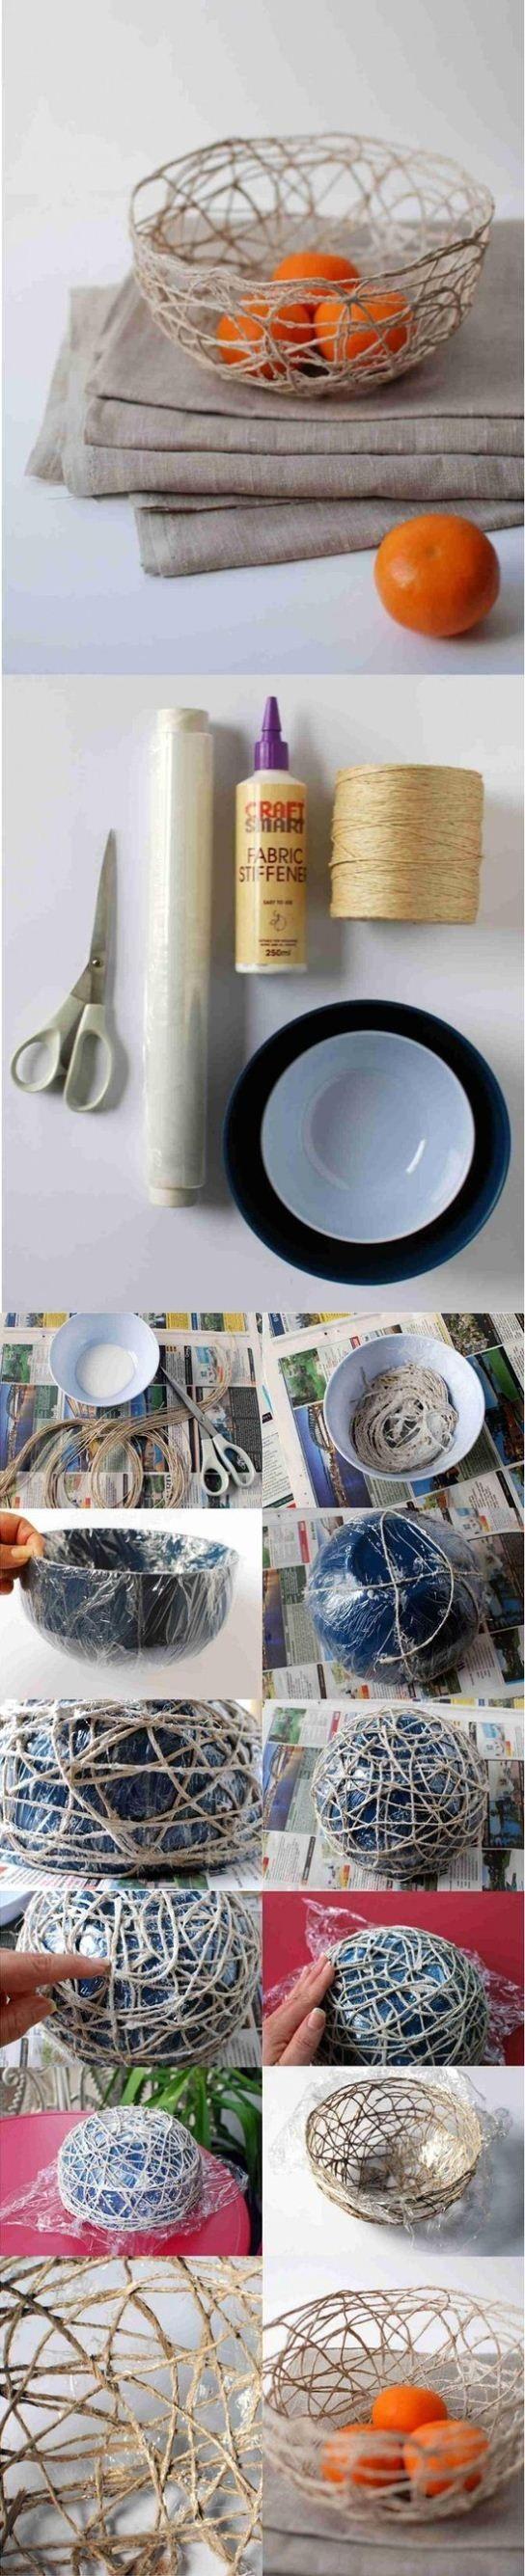 18 Creative And Useful Popular DIY Ideas